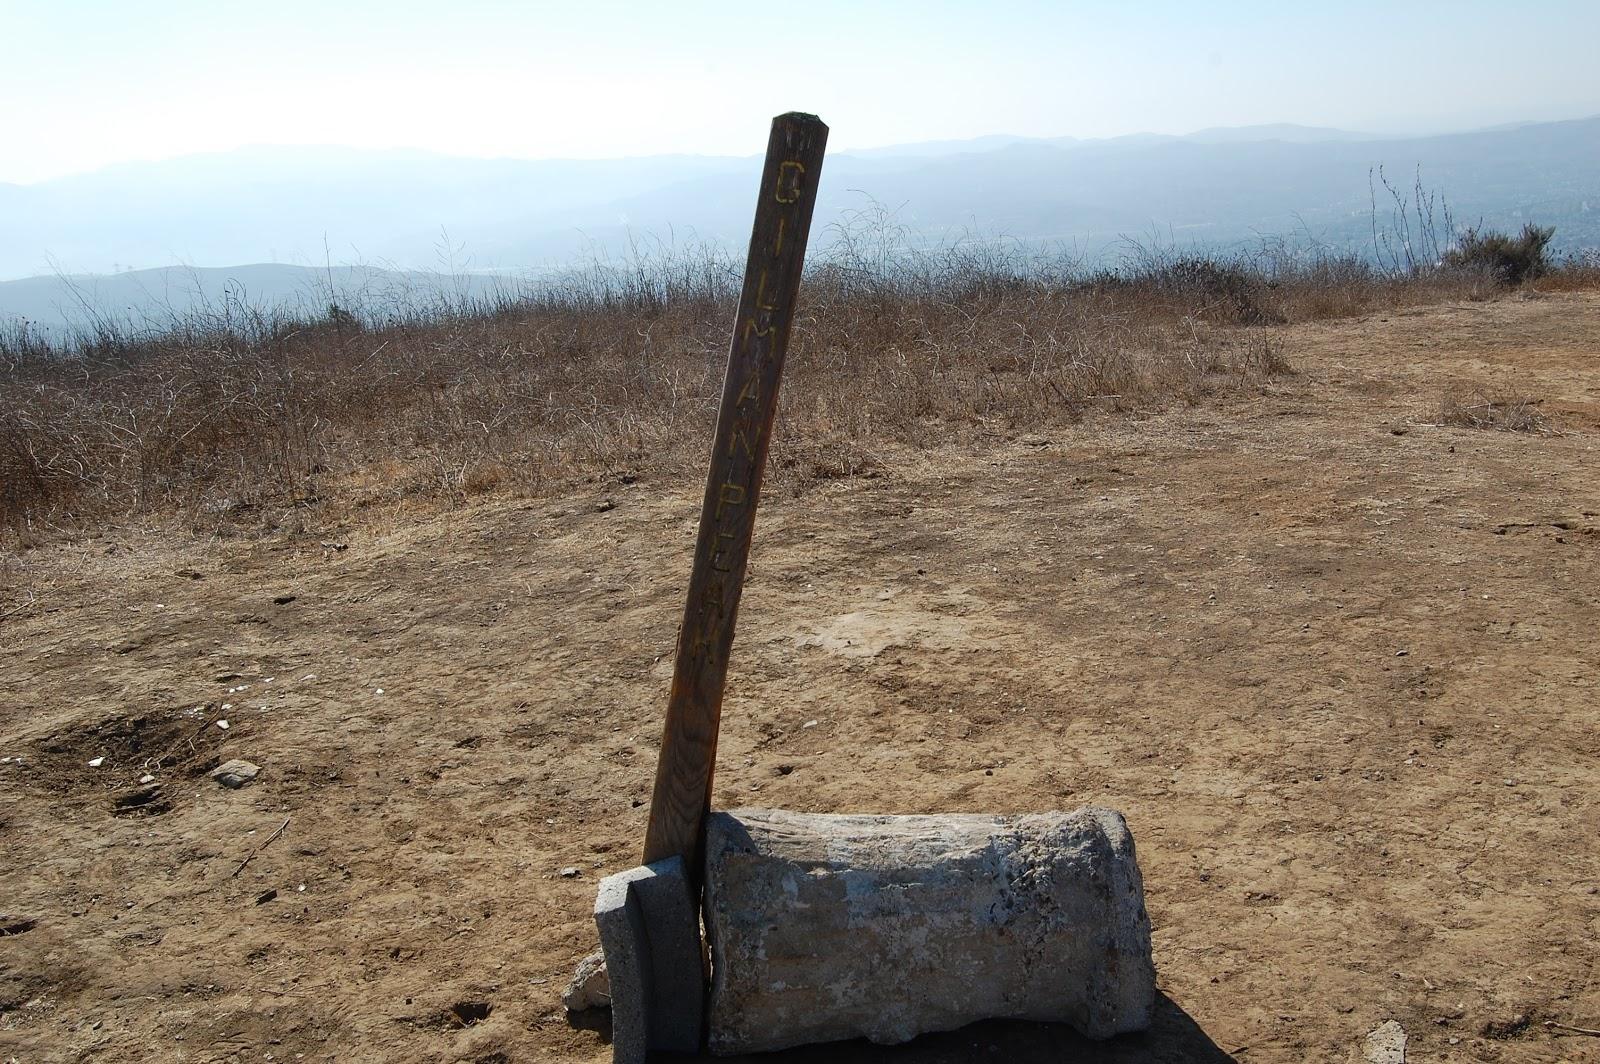 Chino hills hook up